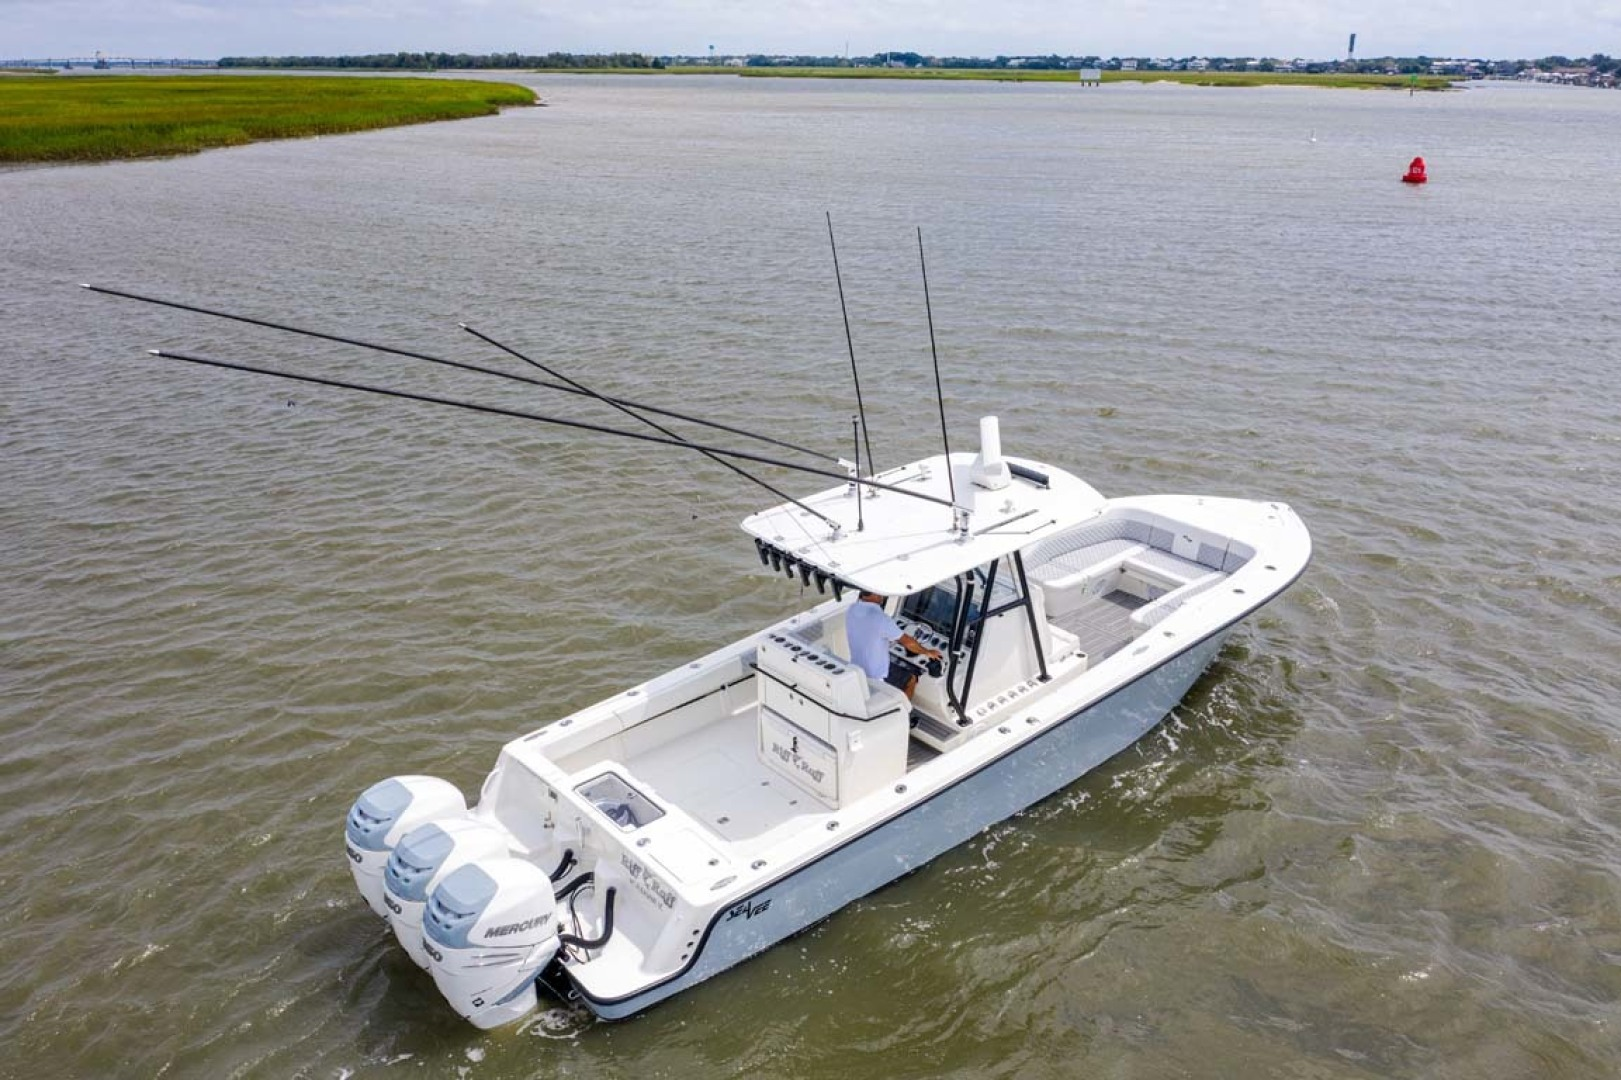 SeaVee-340 B Center Console 2014-Riff Raff Mount Pleasant-South Carolina-United States Deck Profile-1509746 | Thumbnail